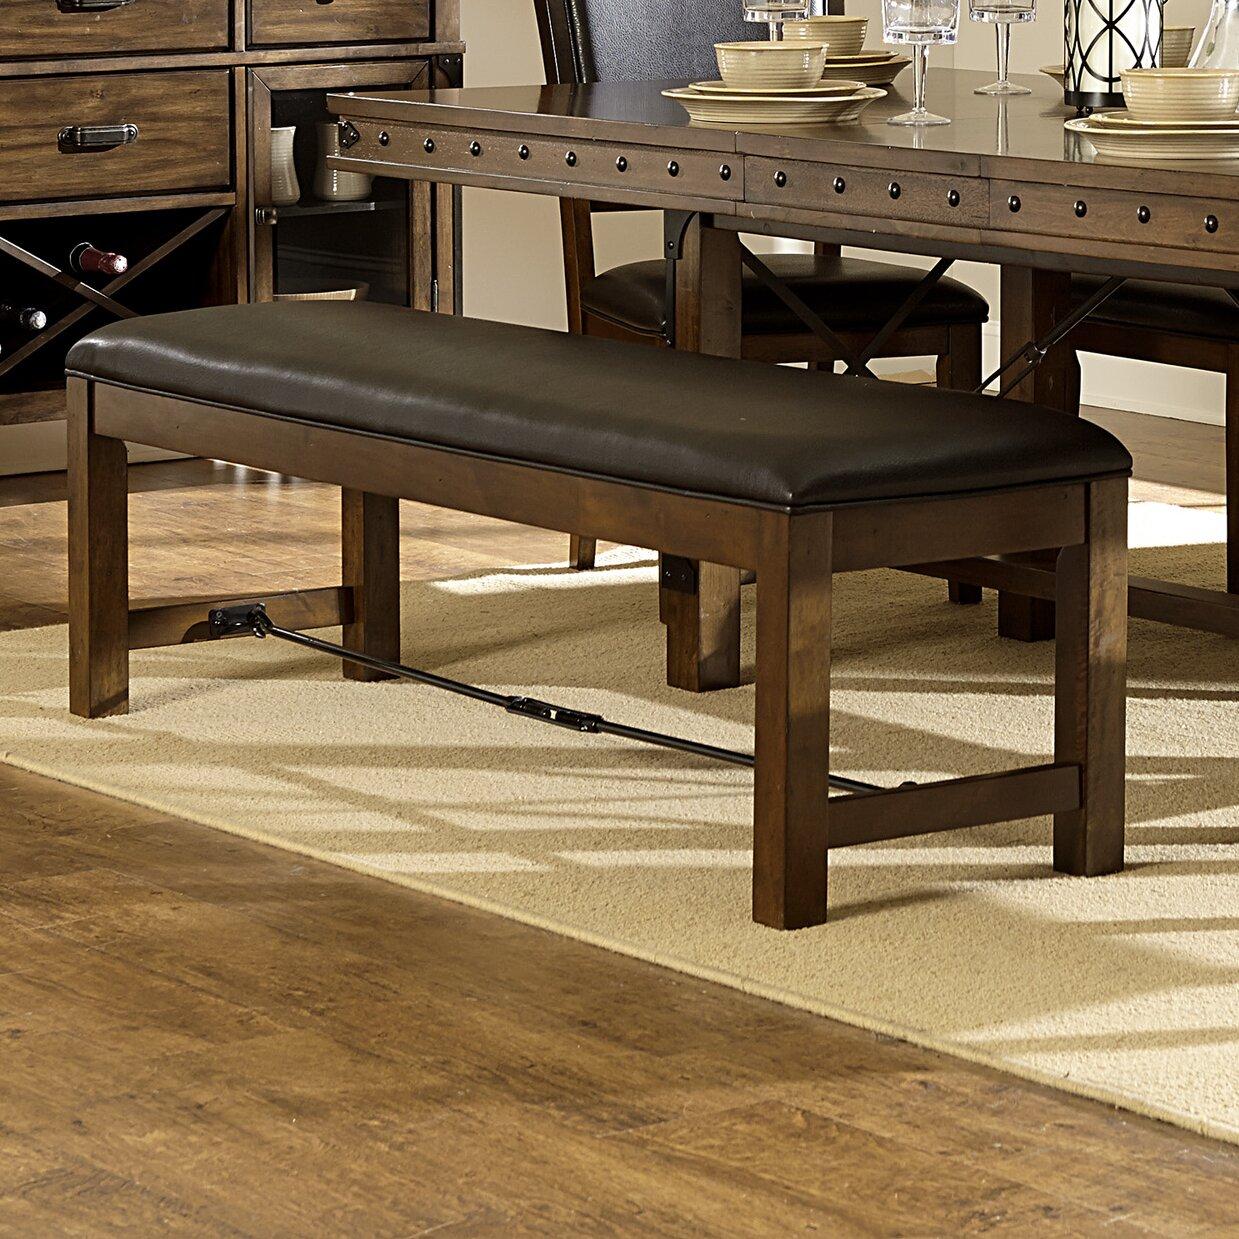 Alegre Wood Upholstered Kitchen Bench